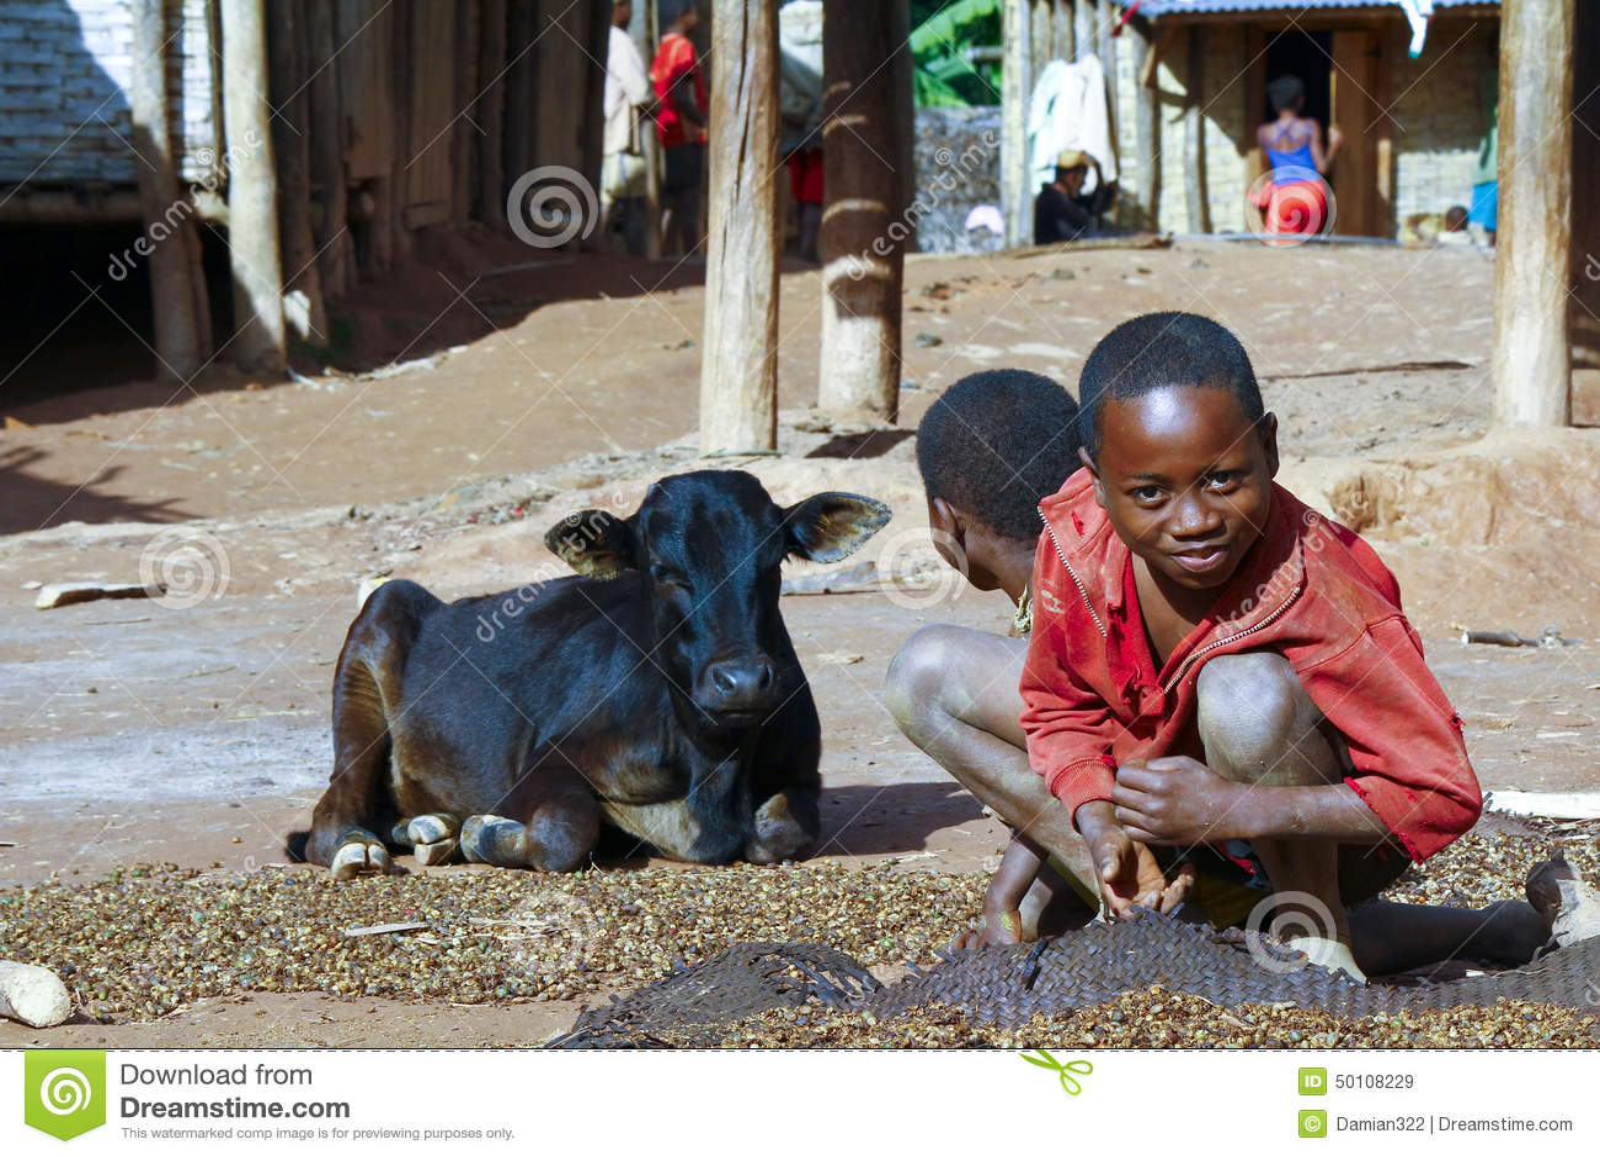 Working poor african children and cow  Madagascar Poor Children Working